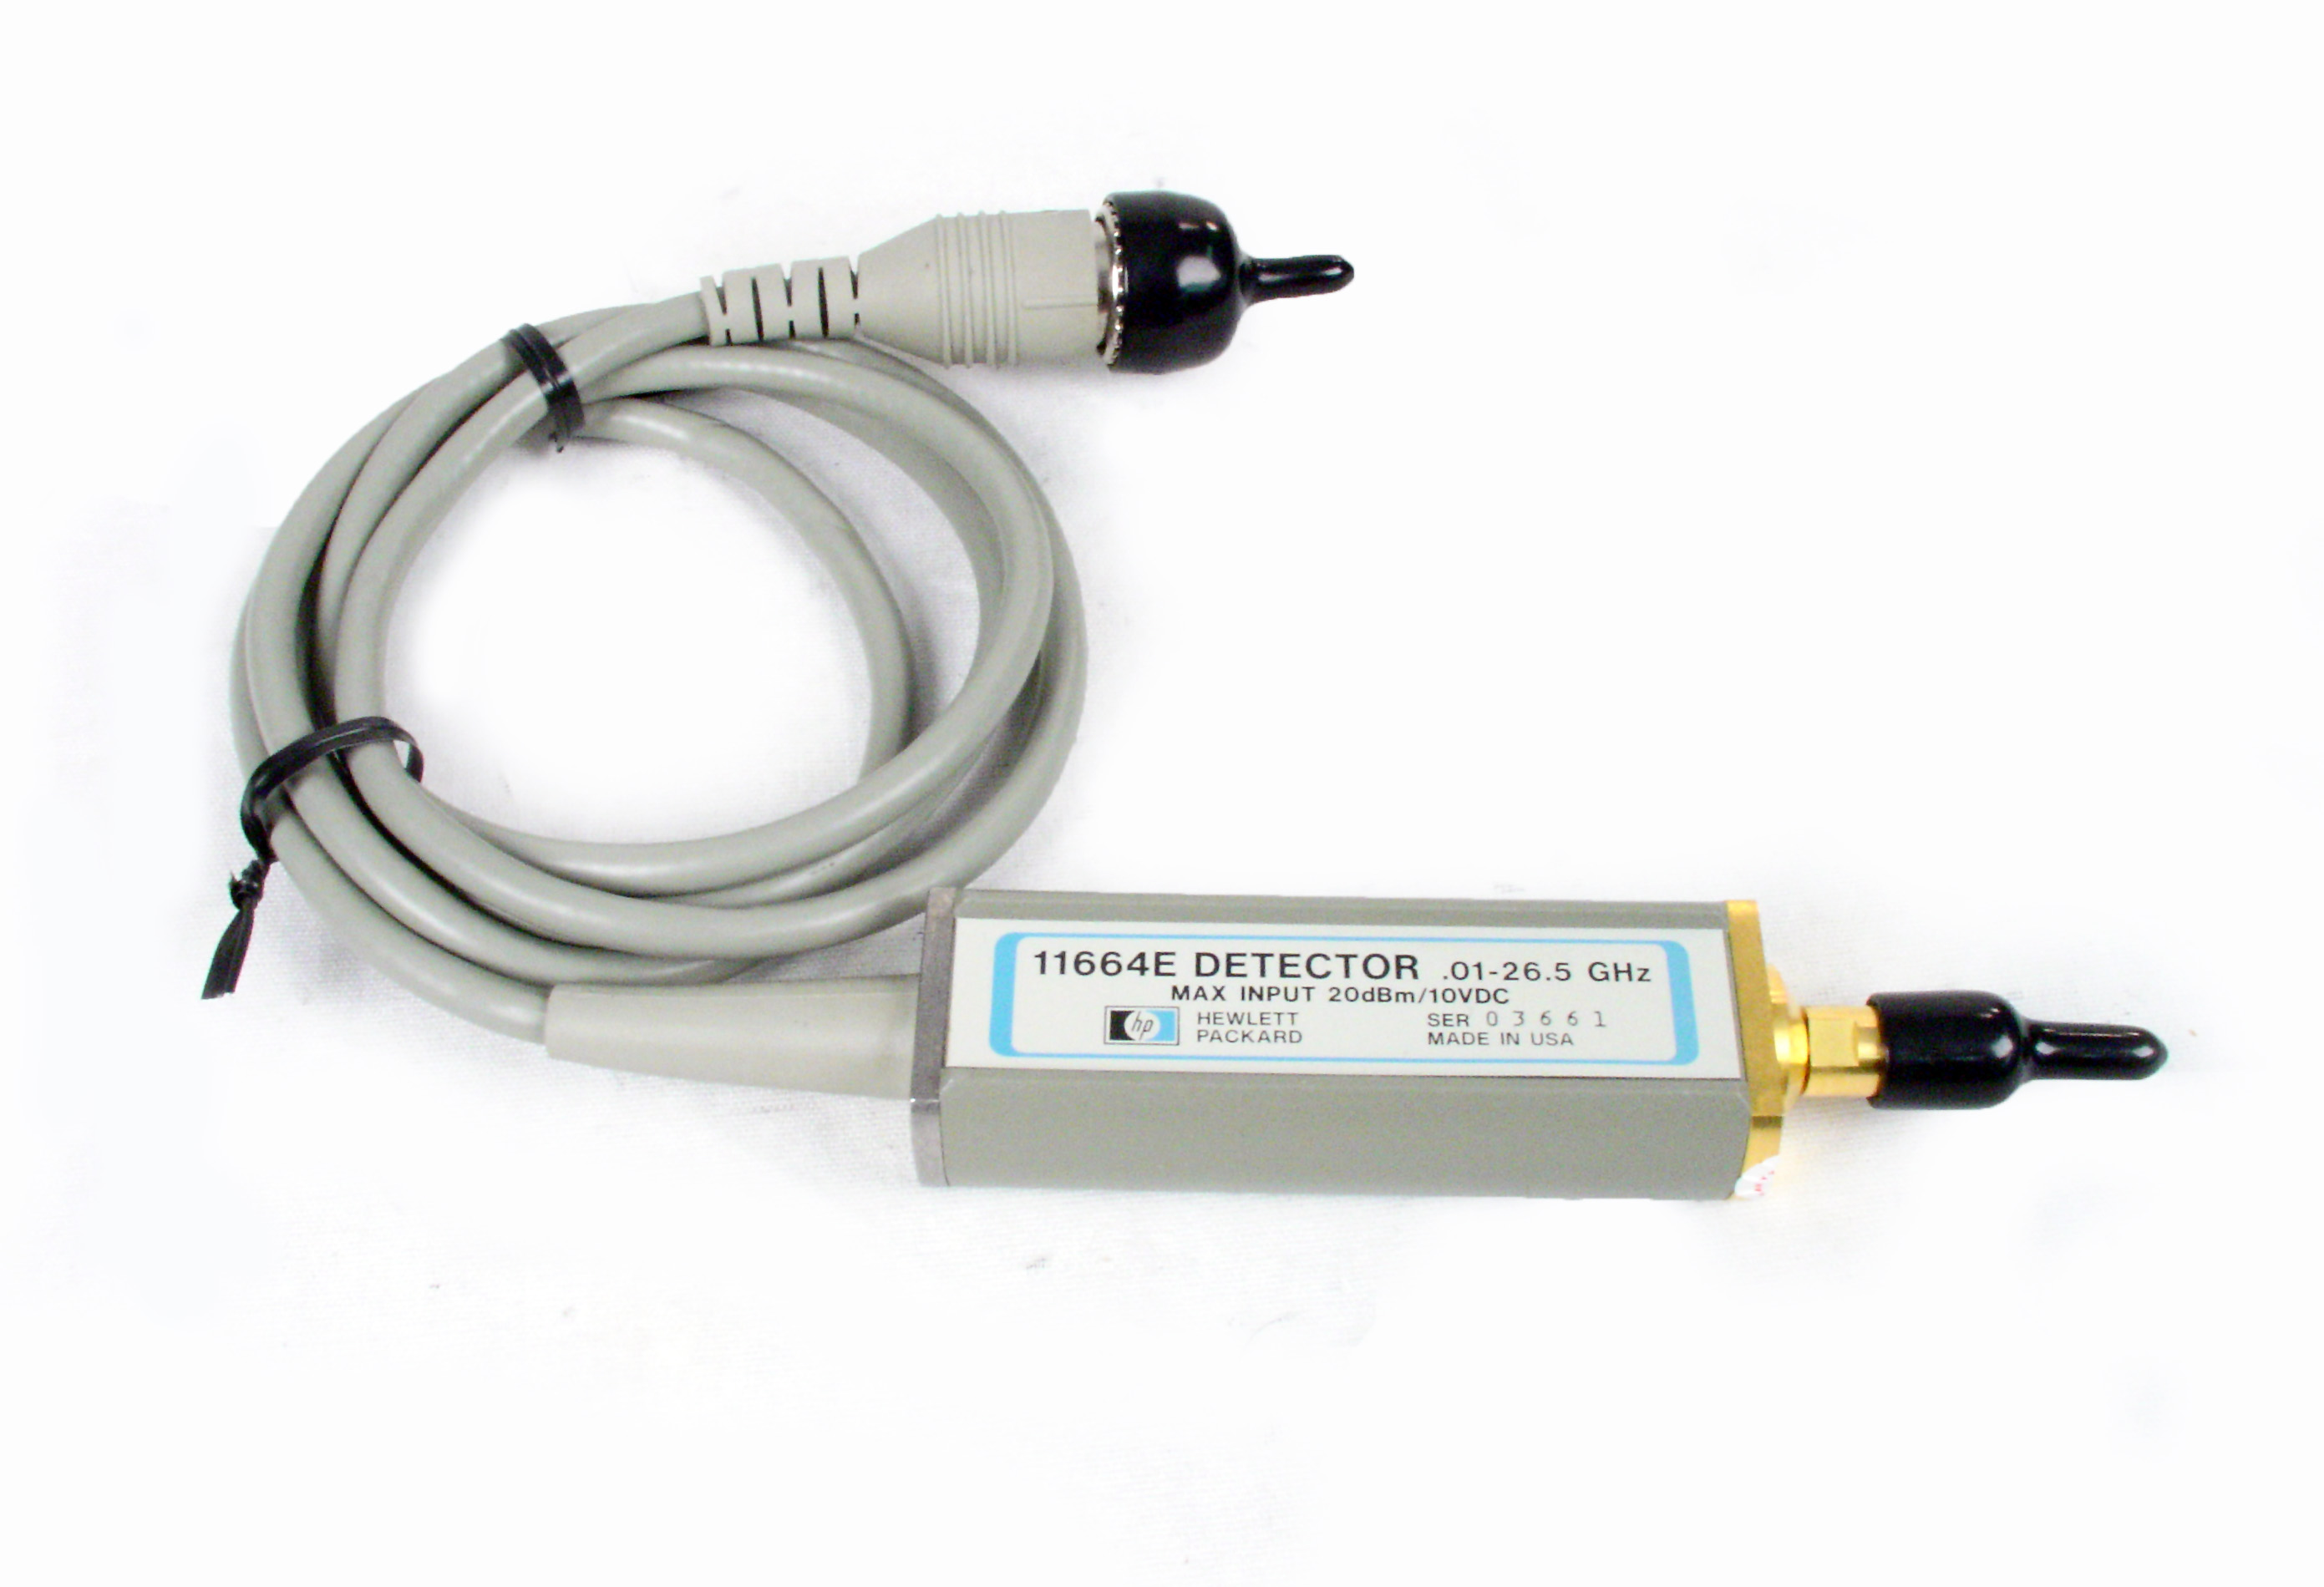 Agilent HP 85025A 0.01-18Ghz Coaxial Detector scalar Analyzer HP 8757D